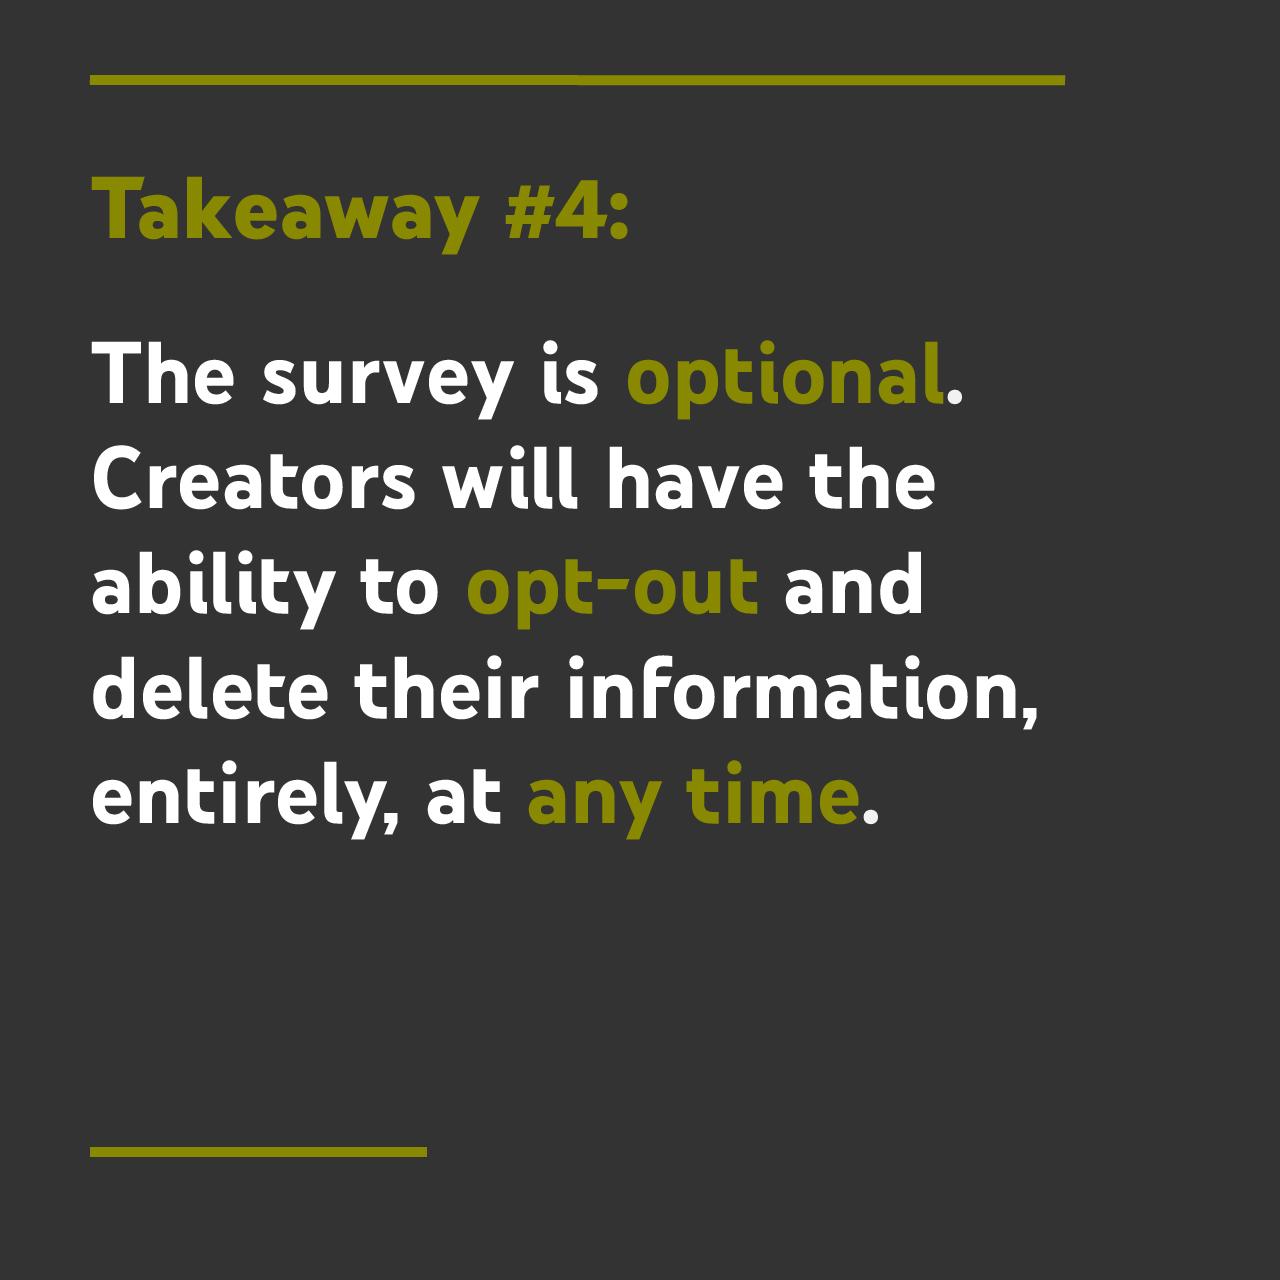 takeaway #4